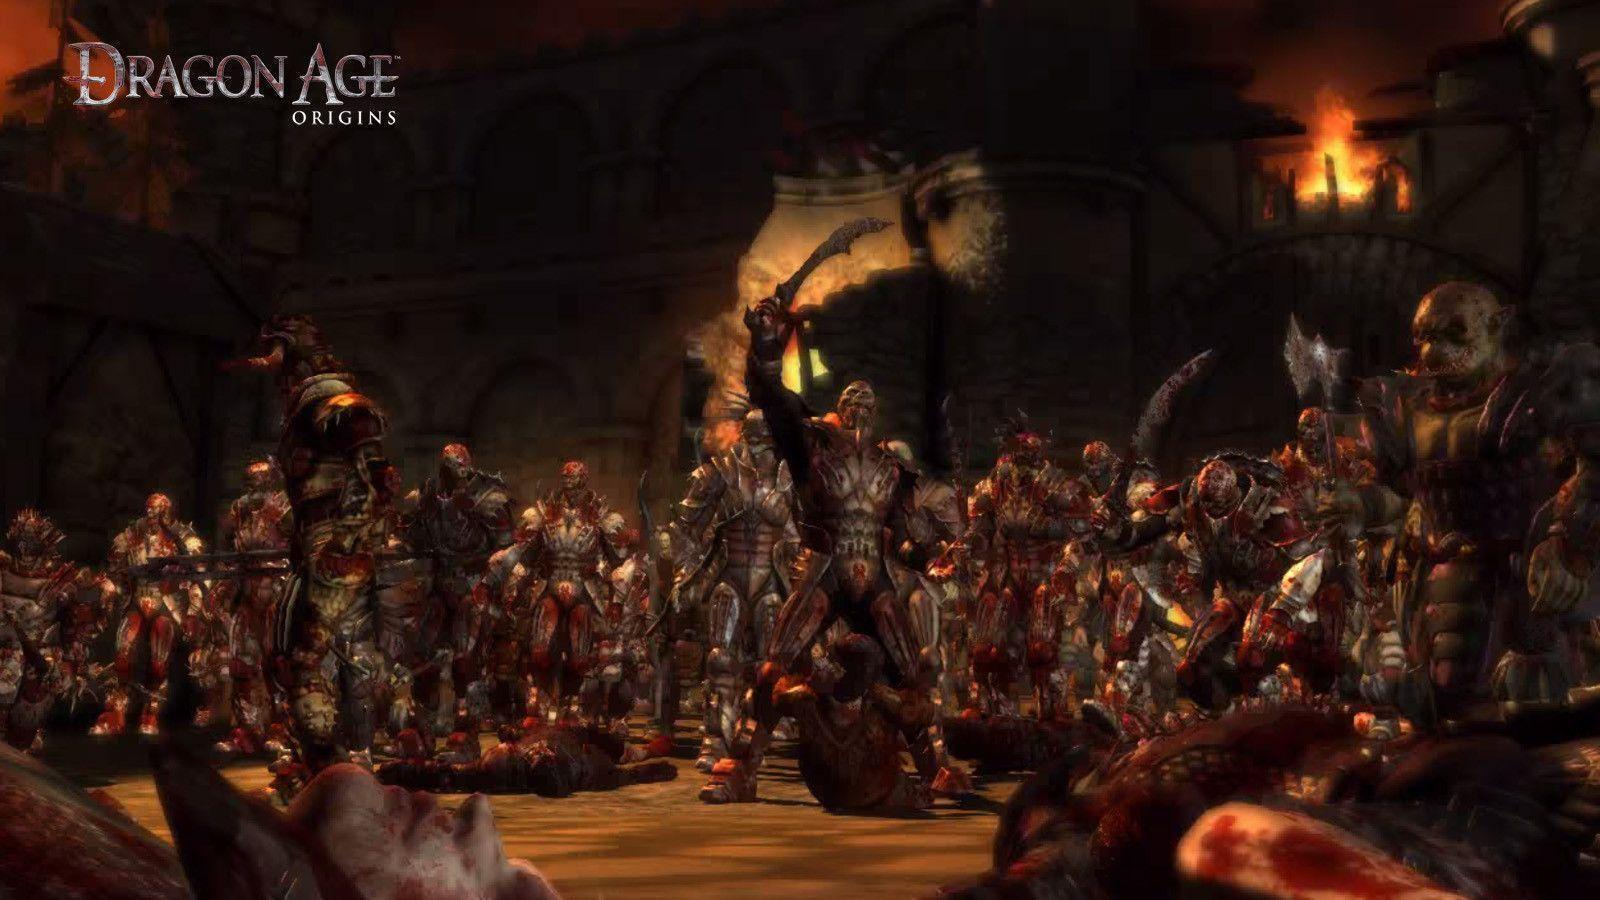 Dragon Age Origins Wallpapers: Dragon Age: Origins Wallpapers